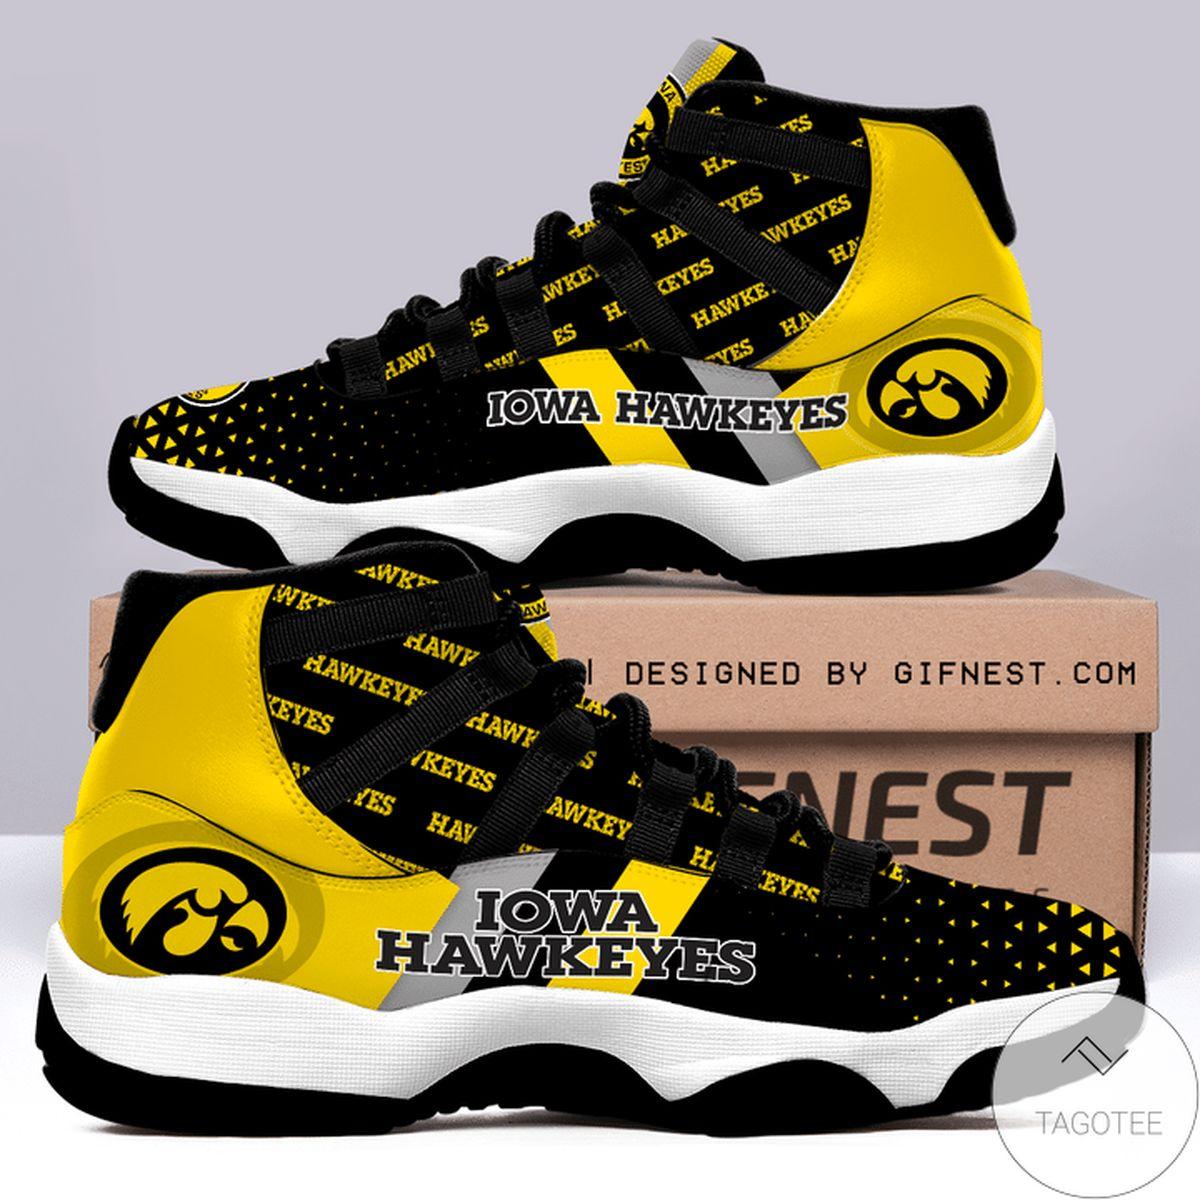 Iowa Hawkeye Air Jordan 11 Shoes